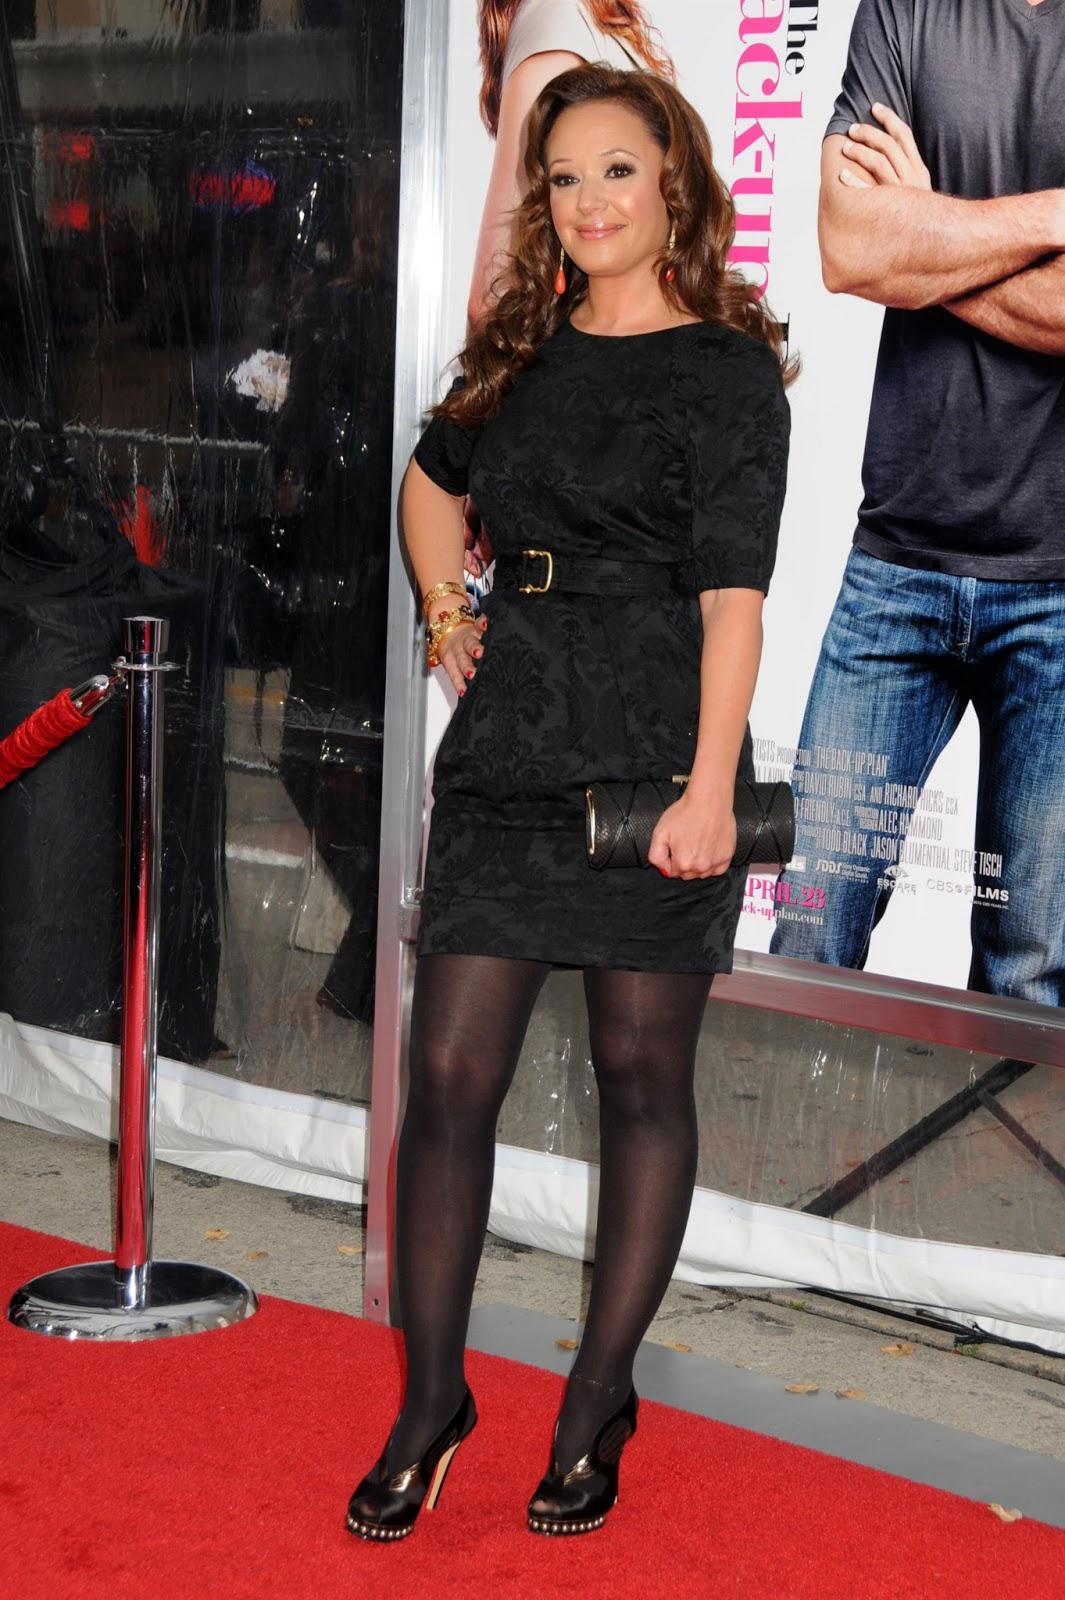 Nylon Celebrities: Leah Remini